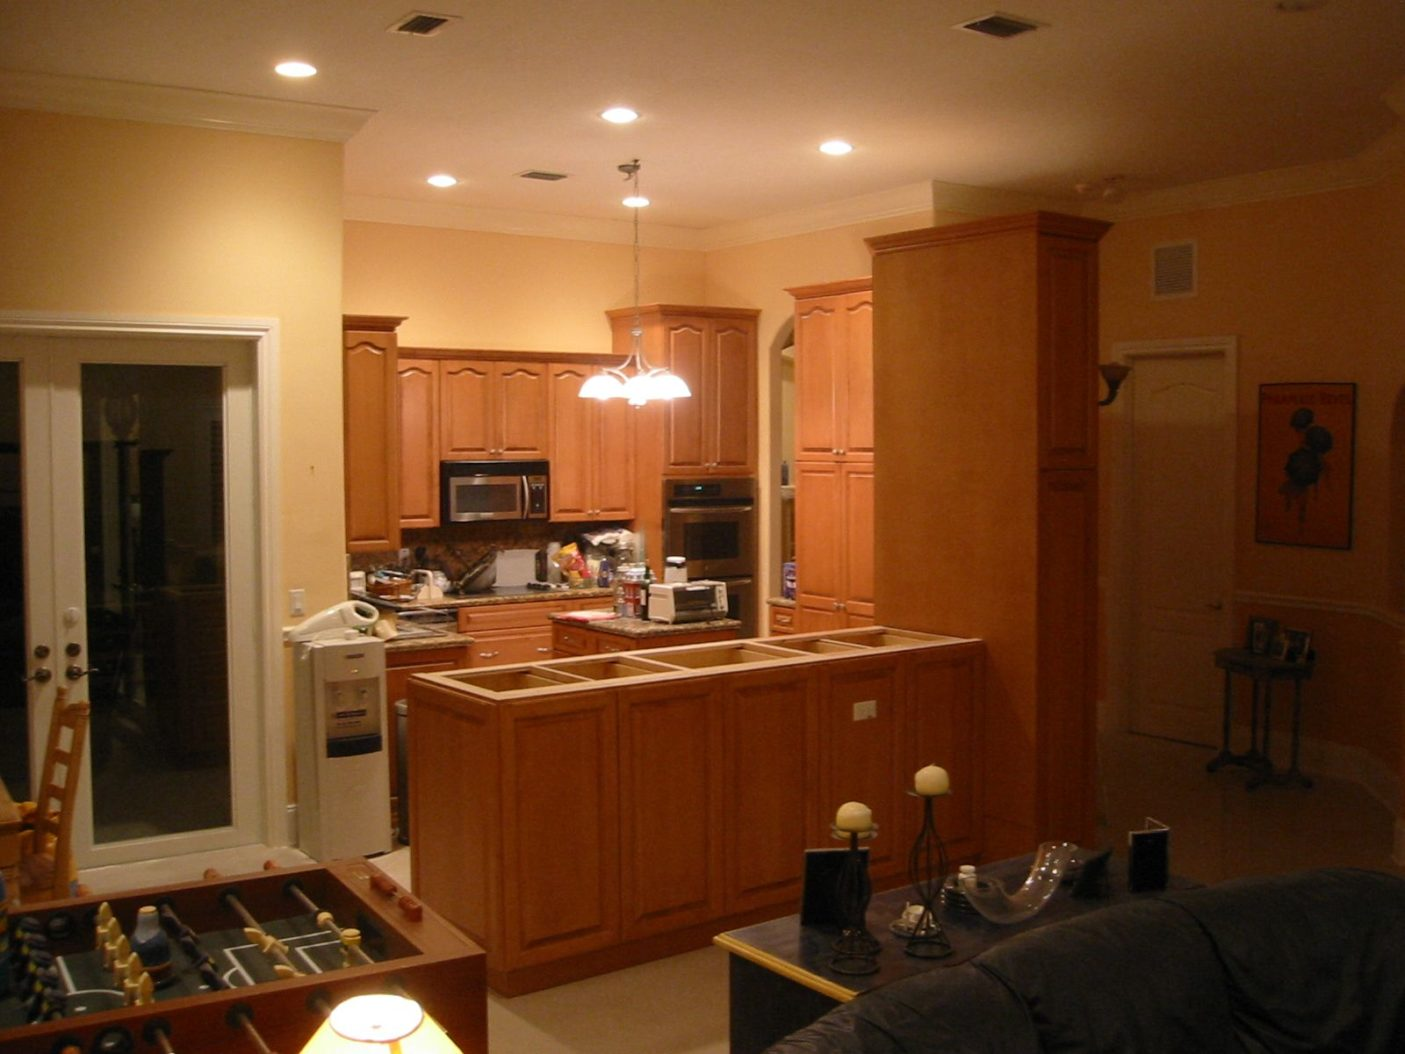 Kitchens-193.jpg